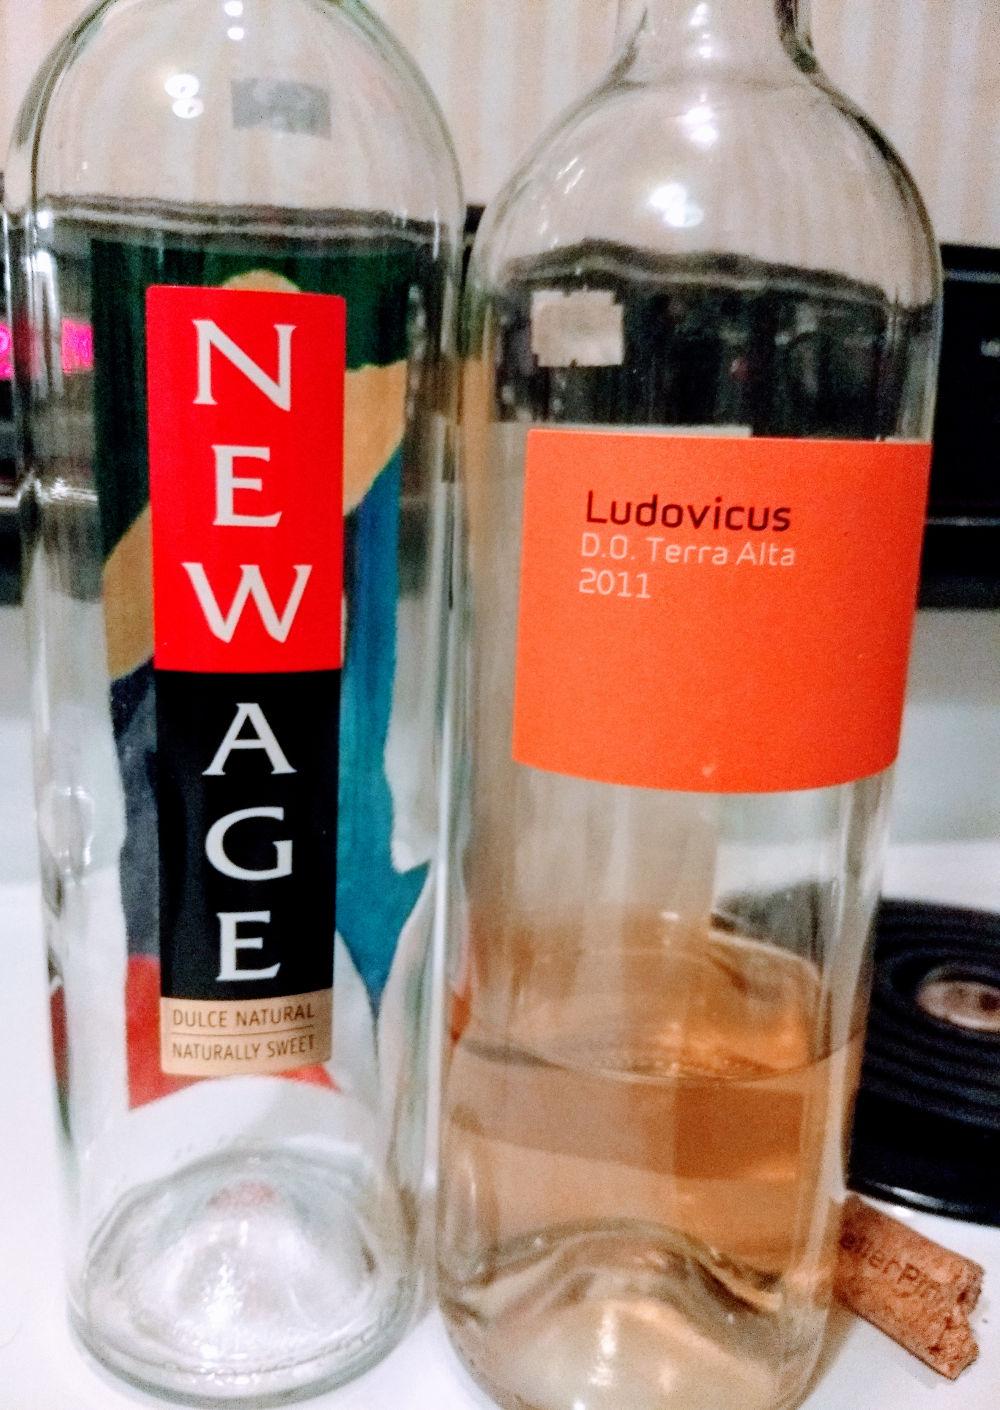 New Age Ludovicus wine image